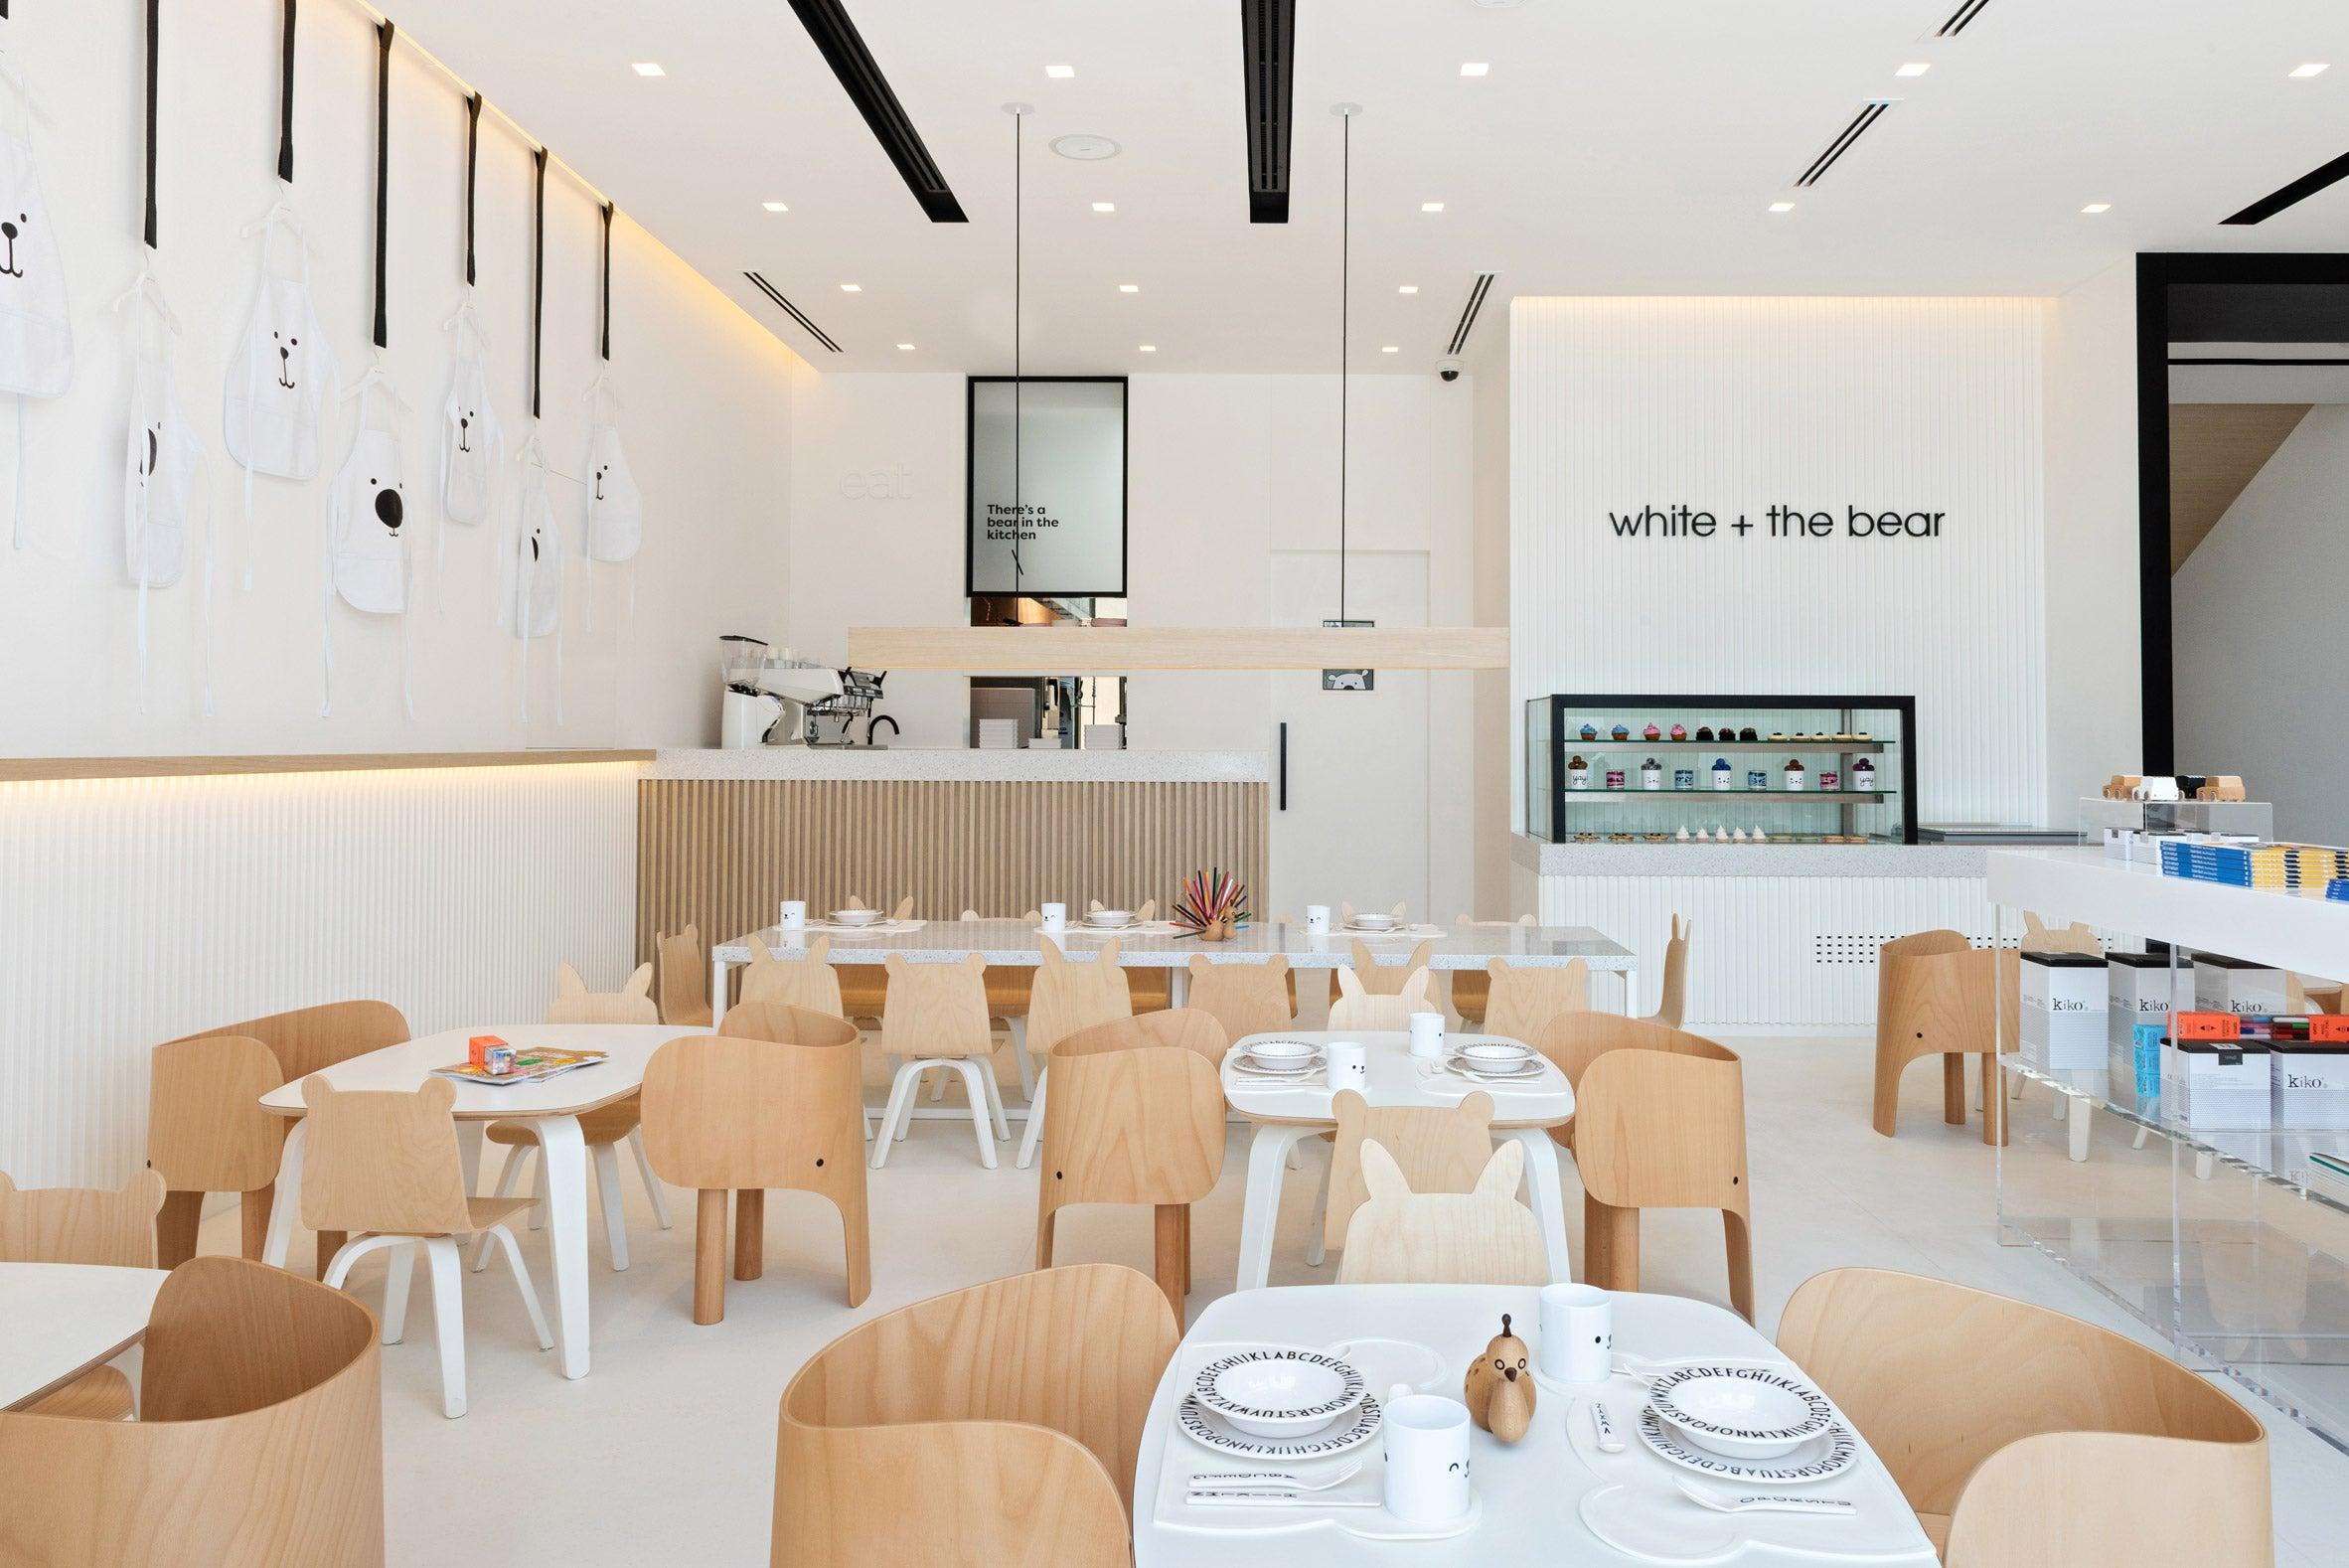 white-the-bear-restaurant-retail-interiors-dubai-sneha-divias-atelier_dezeen_2364_col_9